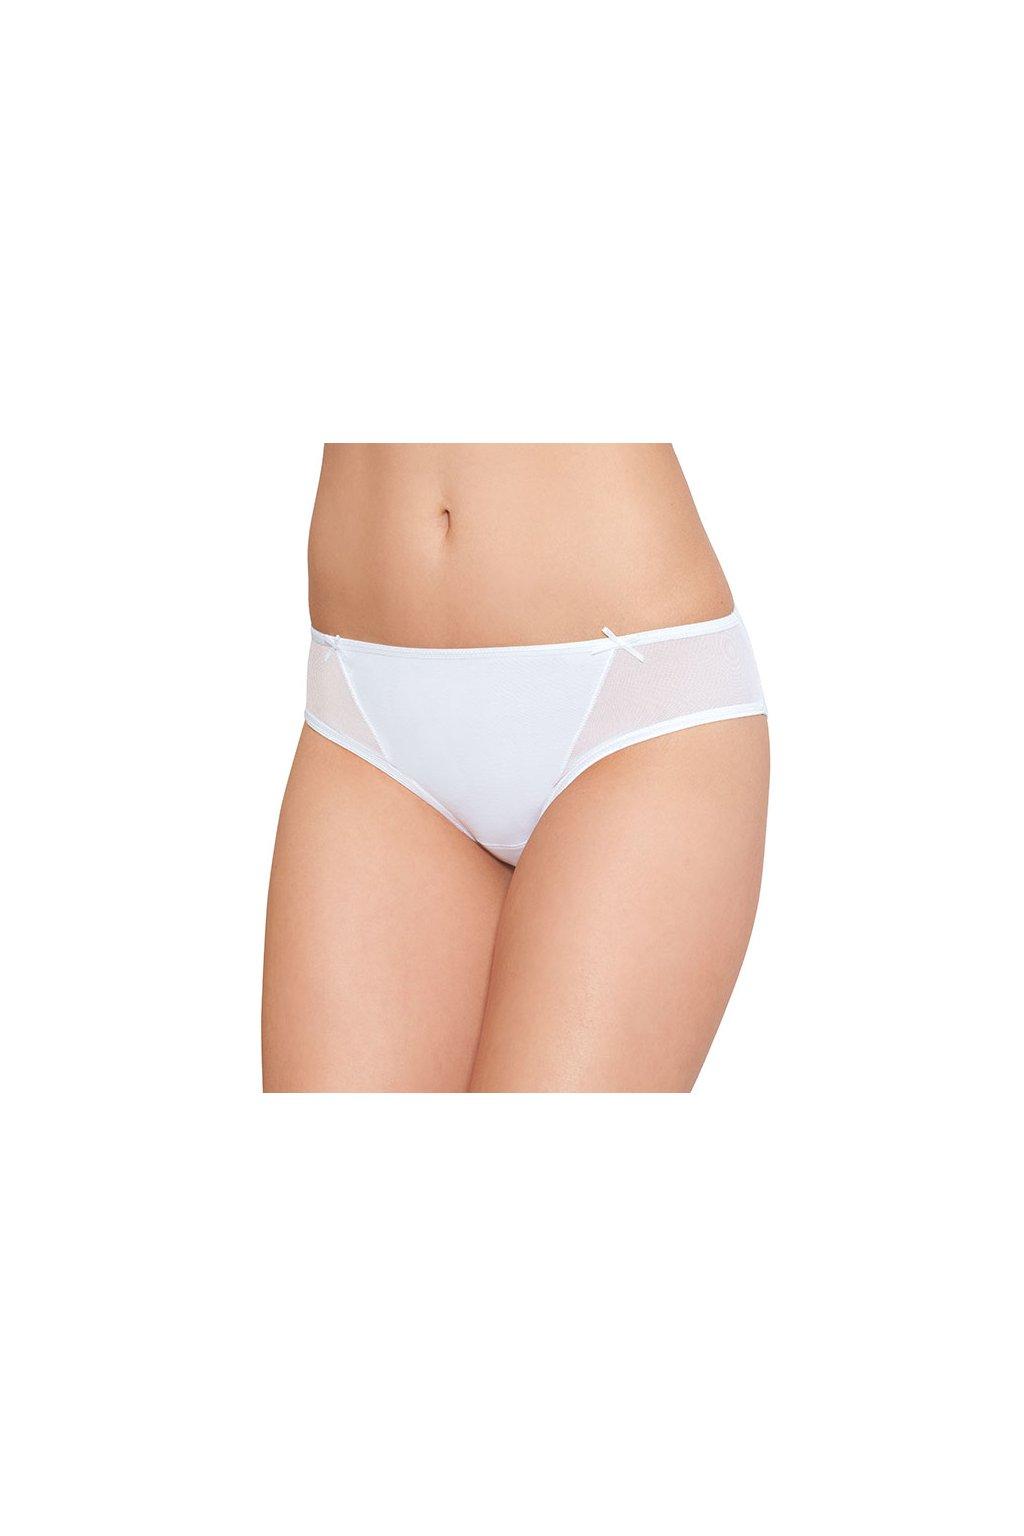 Dámské kalhotky, 10087 1, bílá